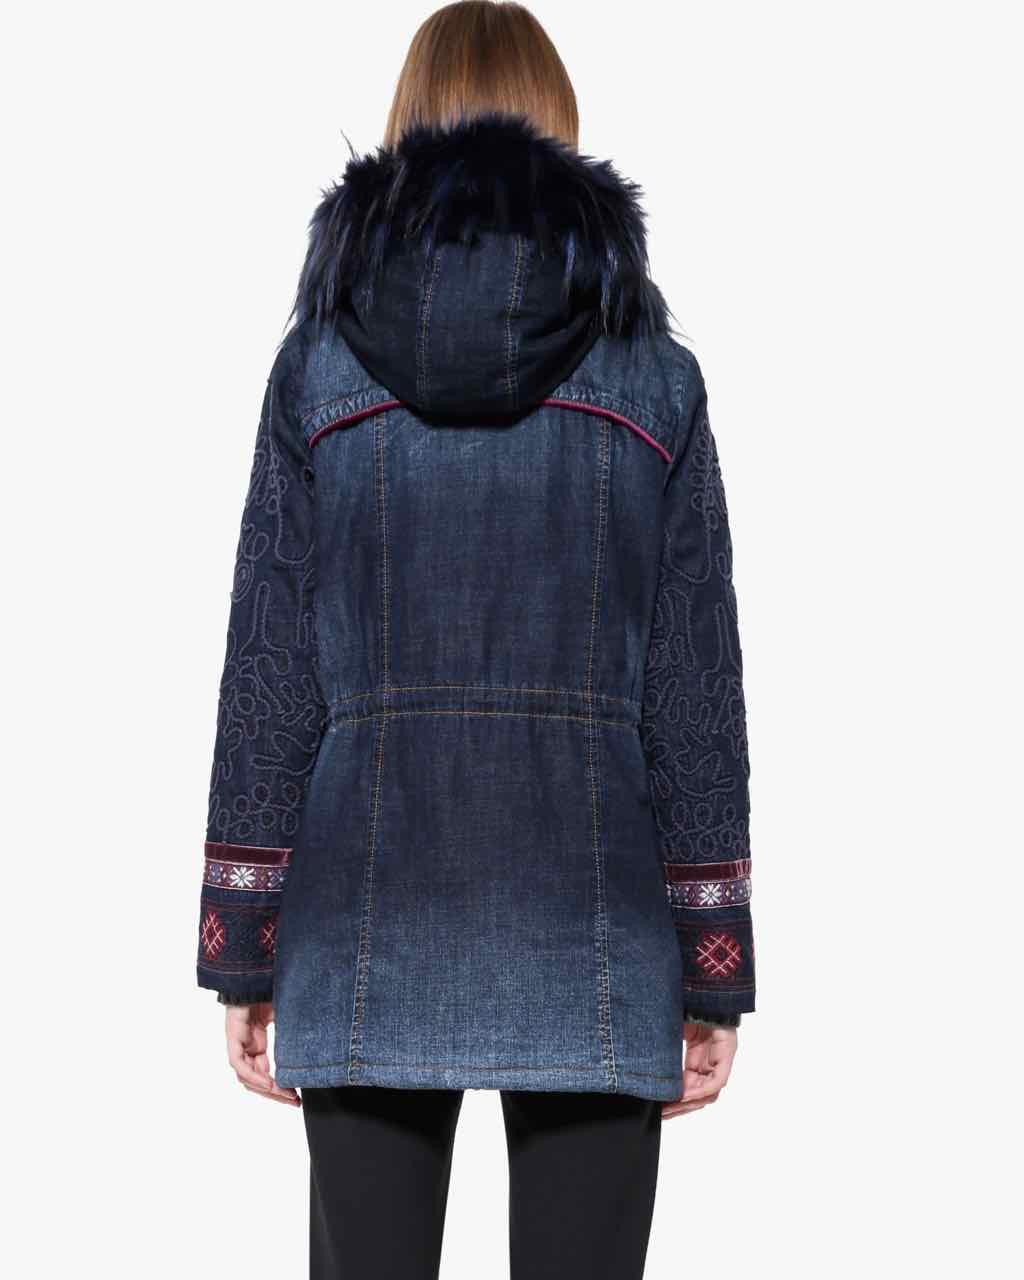 8031e581f Order Winter Jackets Online